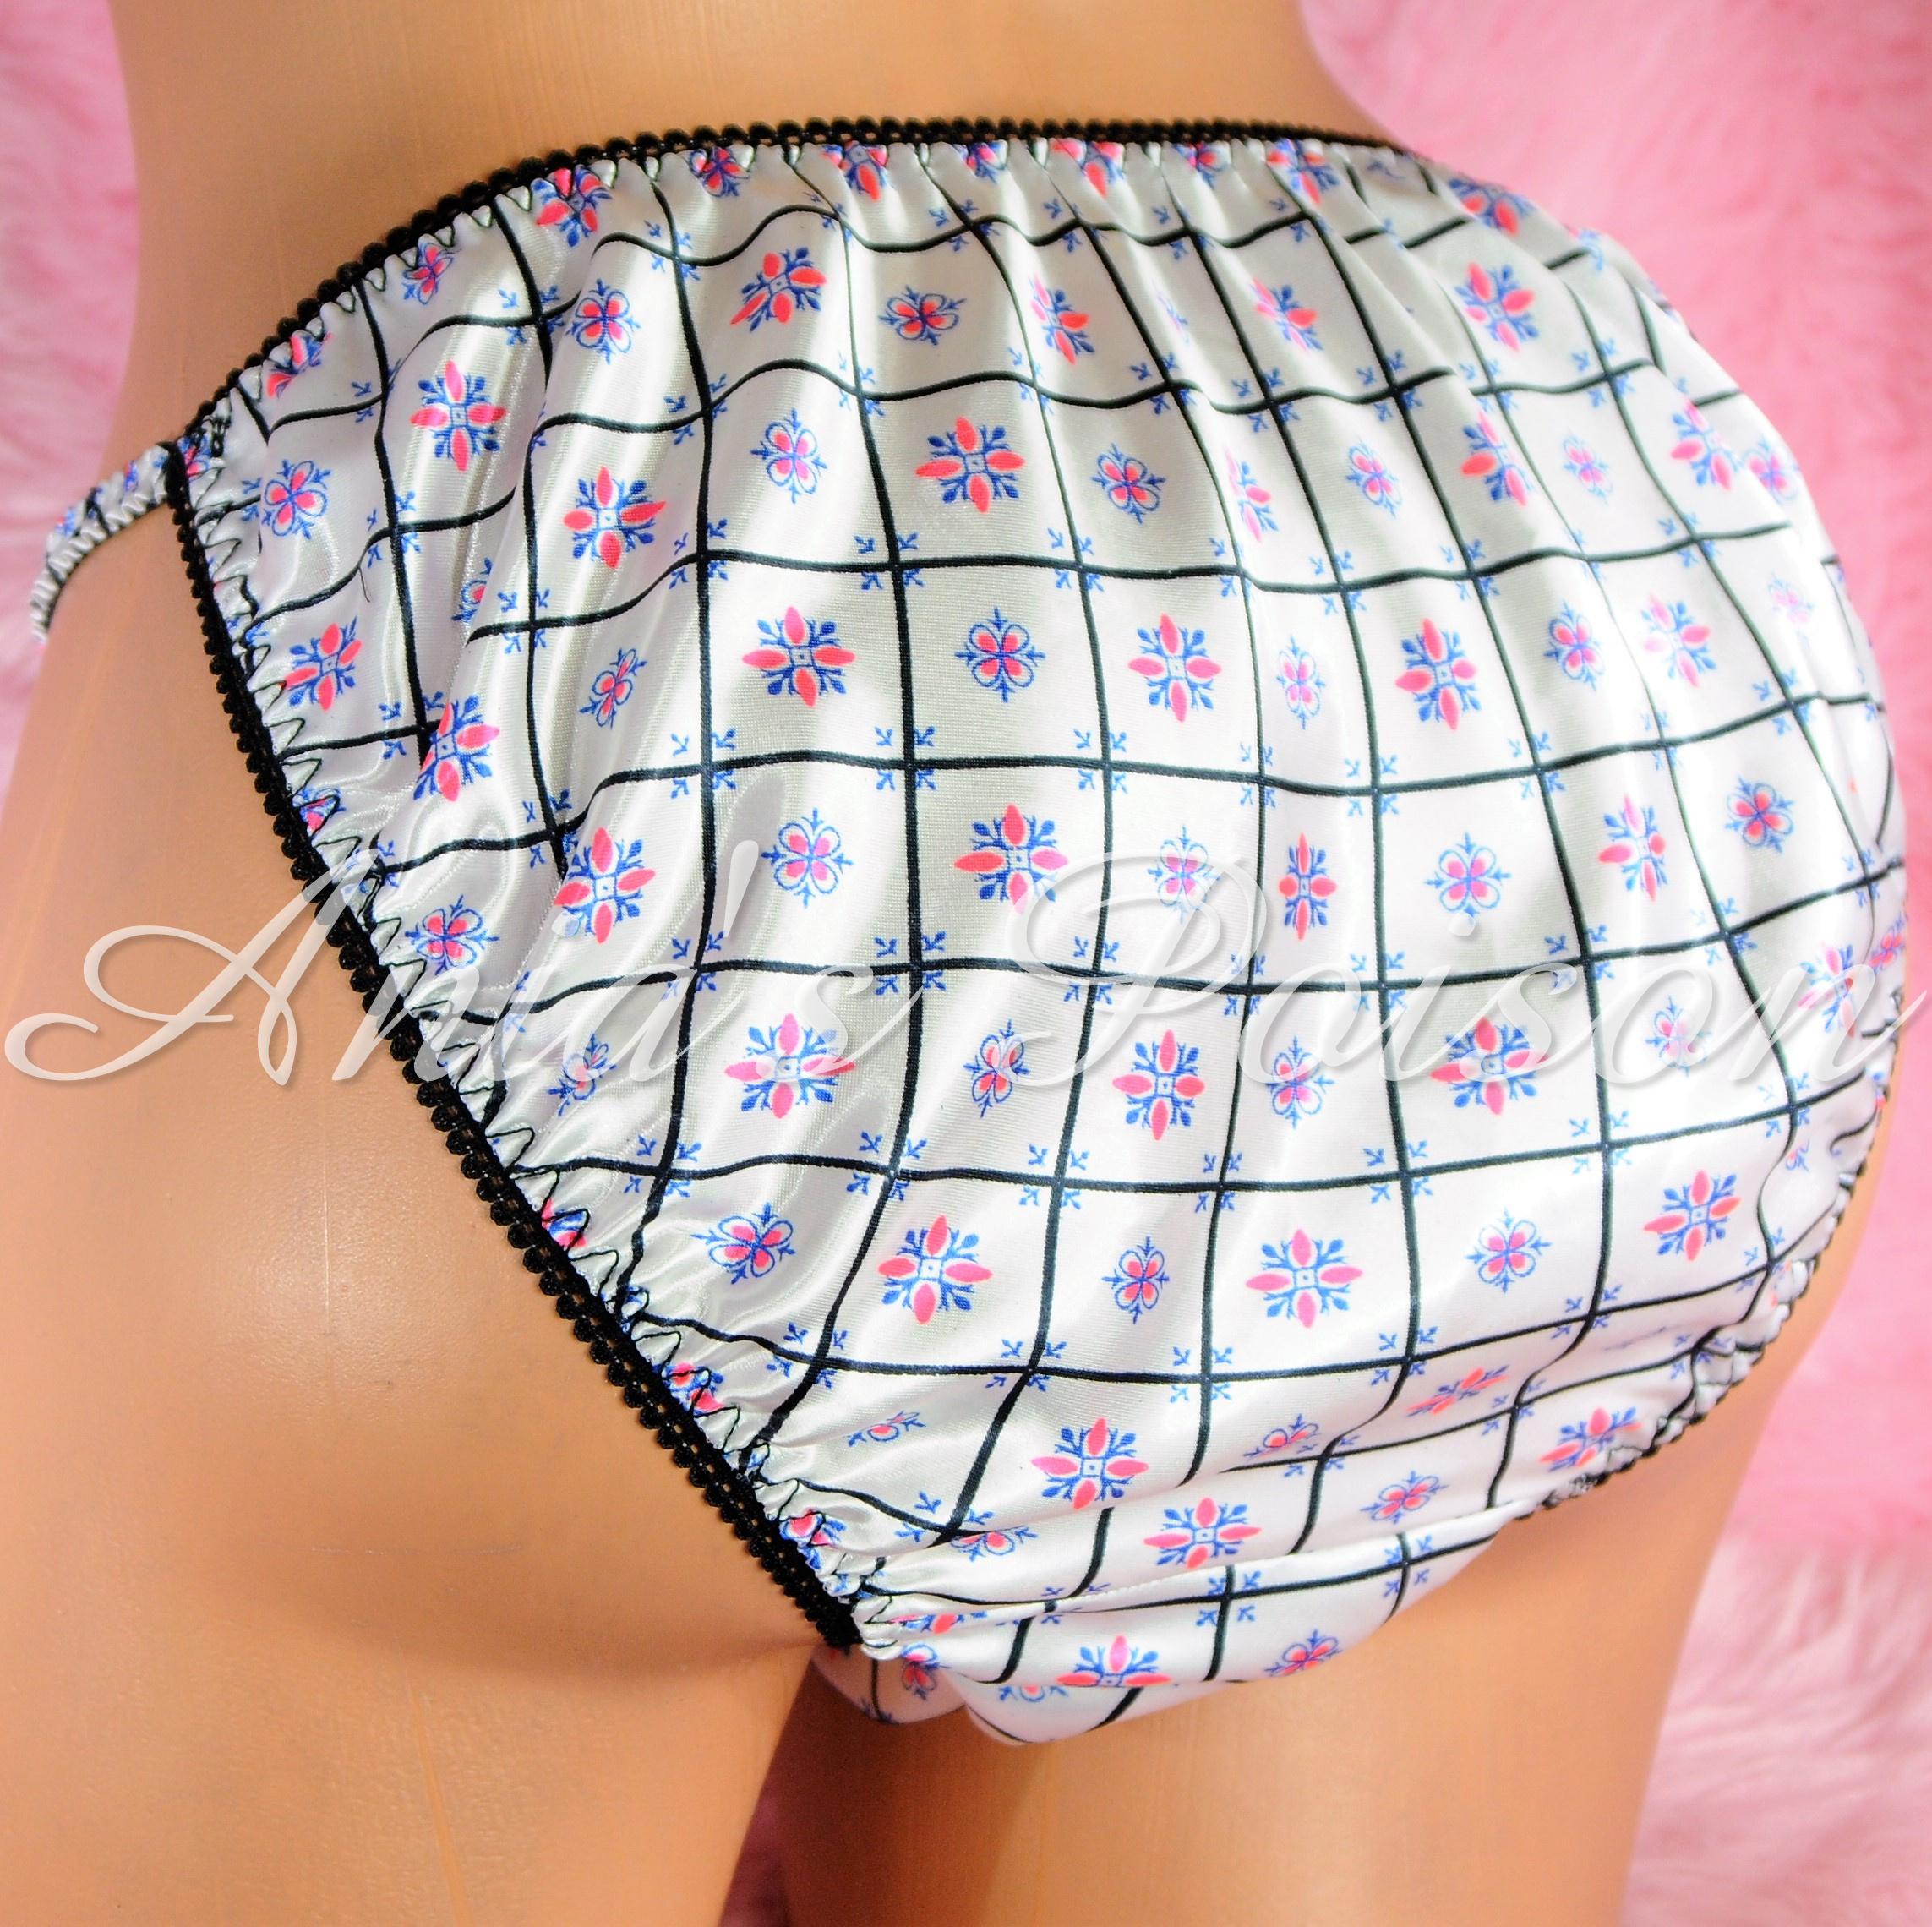 Sissy Silky Satin Mens Panties in Black Pink White Retro Print String bikini underwear